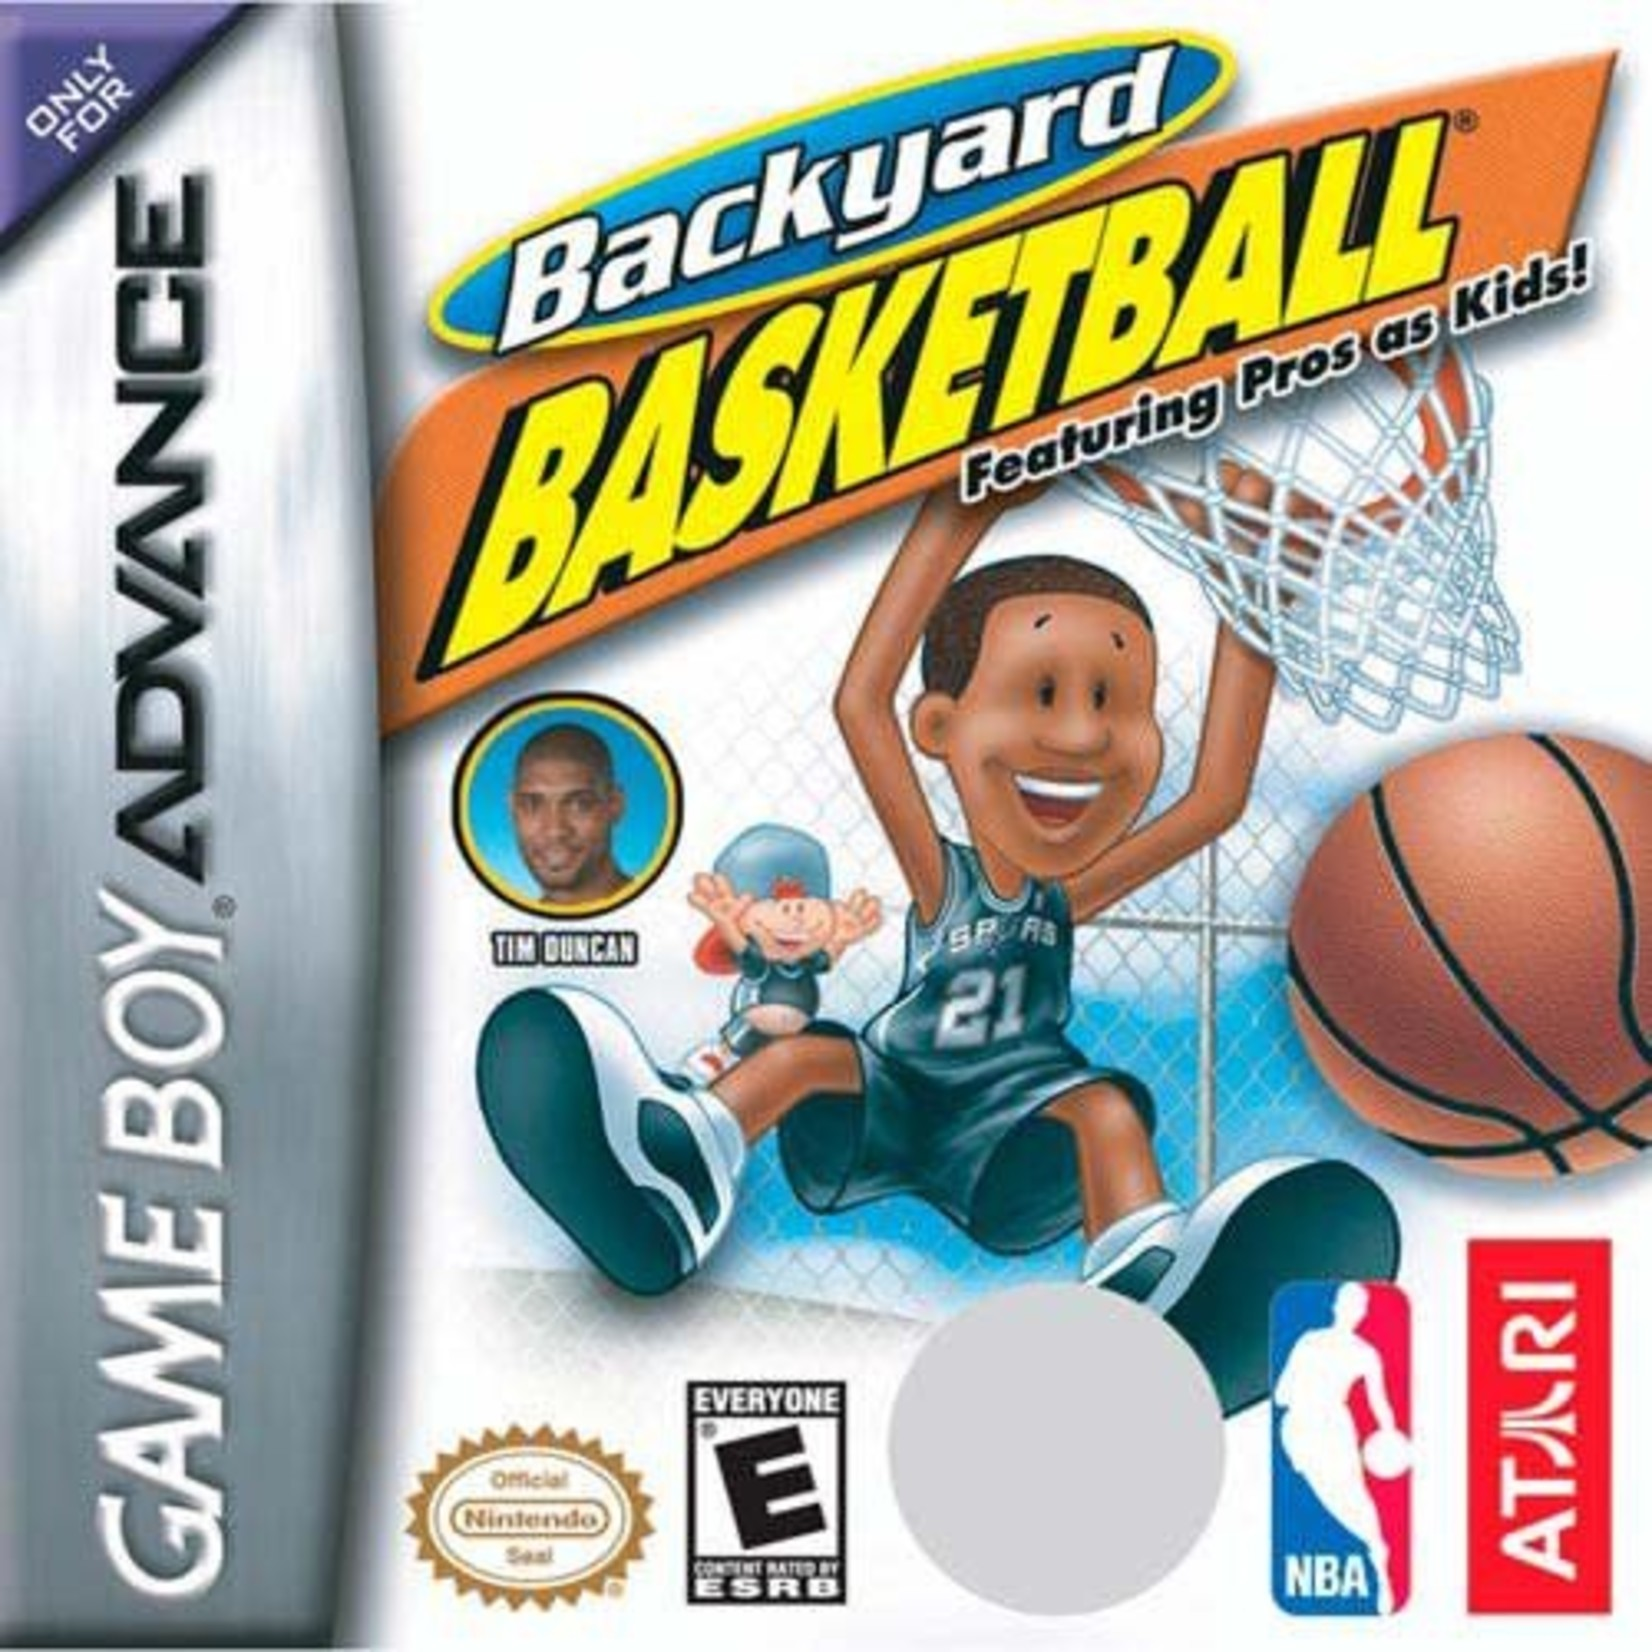 GBAU-Backyard Basketball